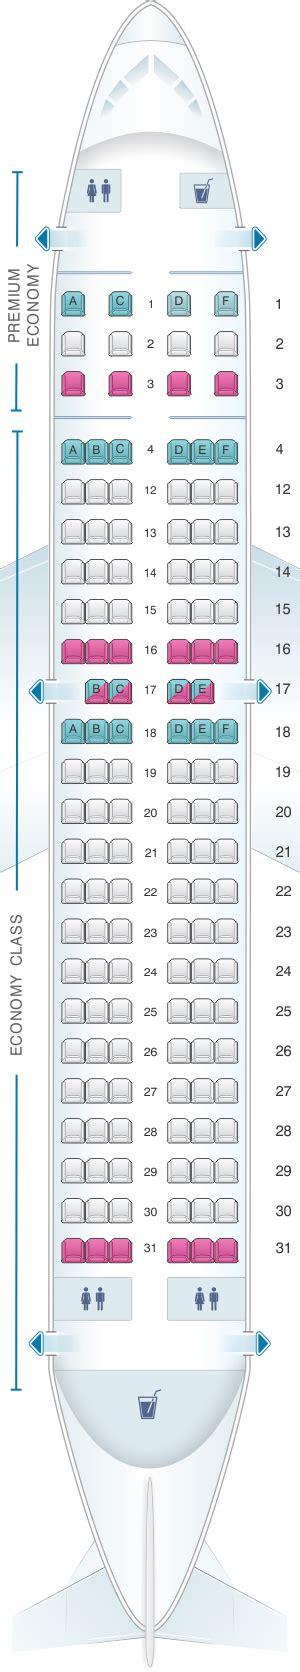 plan de cabine air canada airbus a319 100 config 3